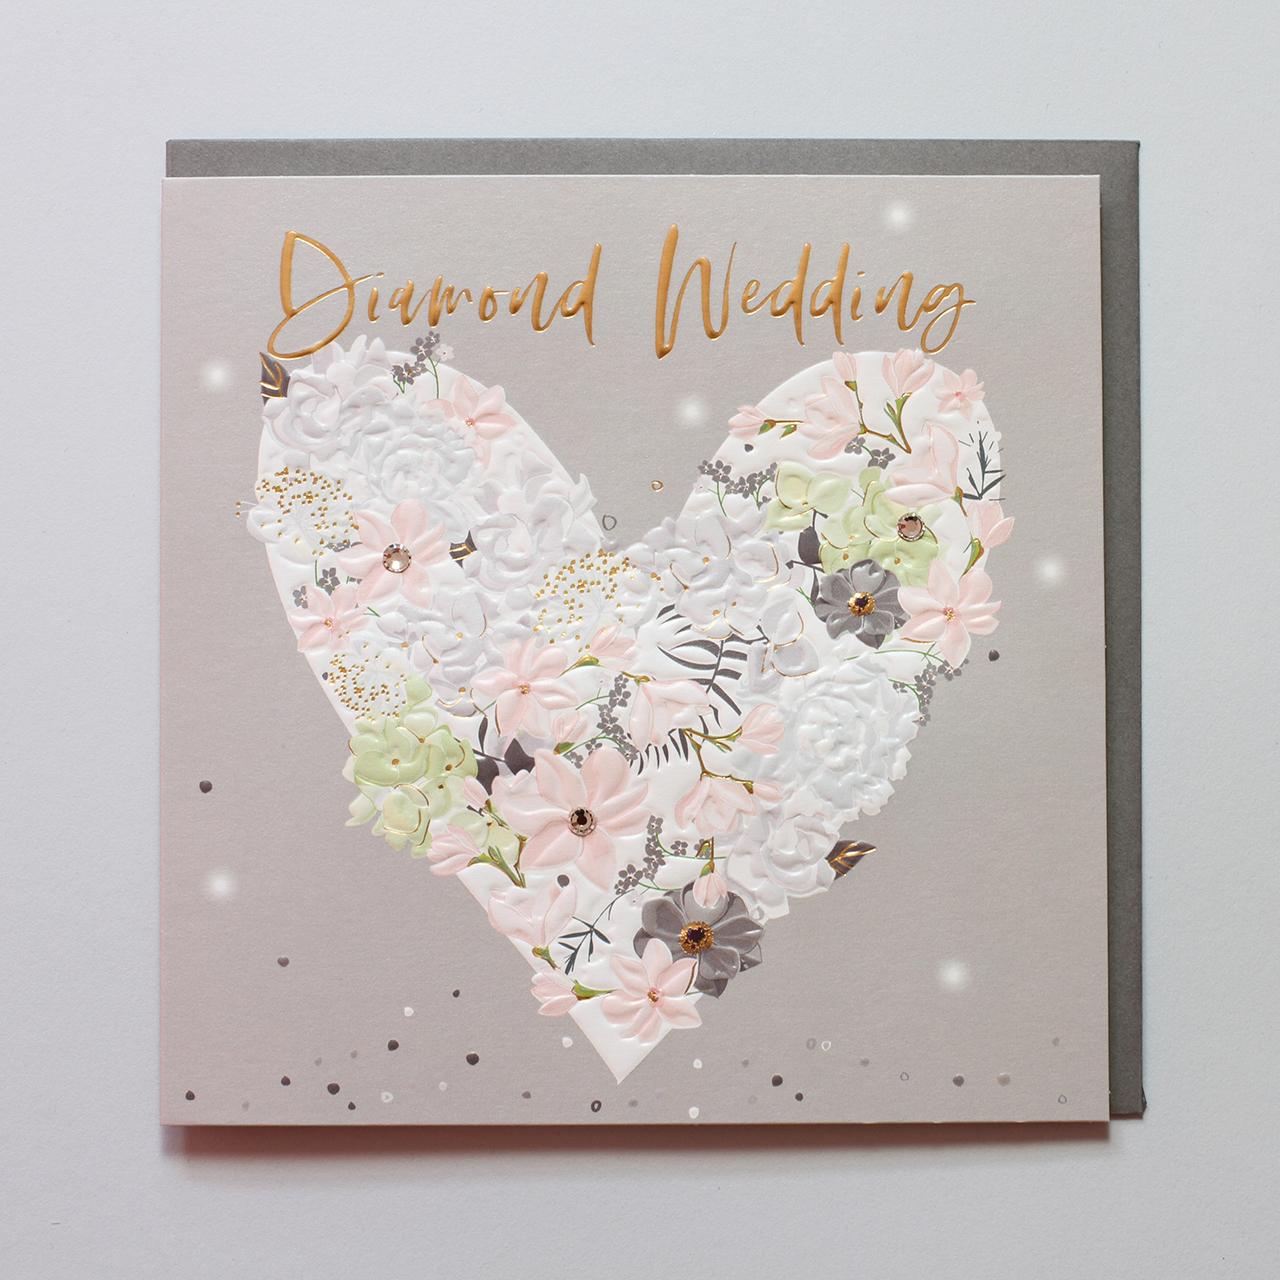 Belly Button Designs, Diamond Wedding Anniversary